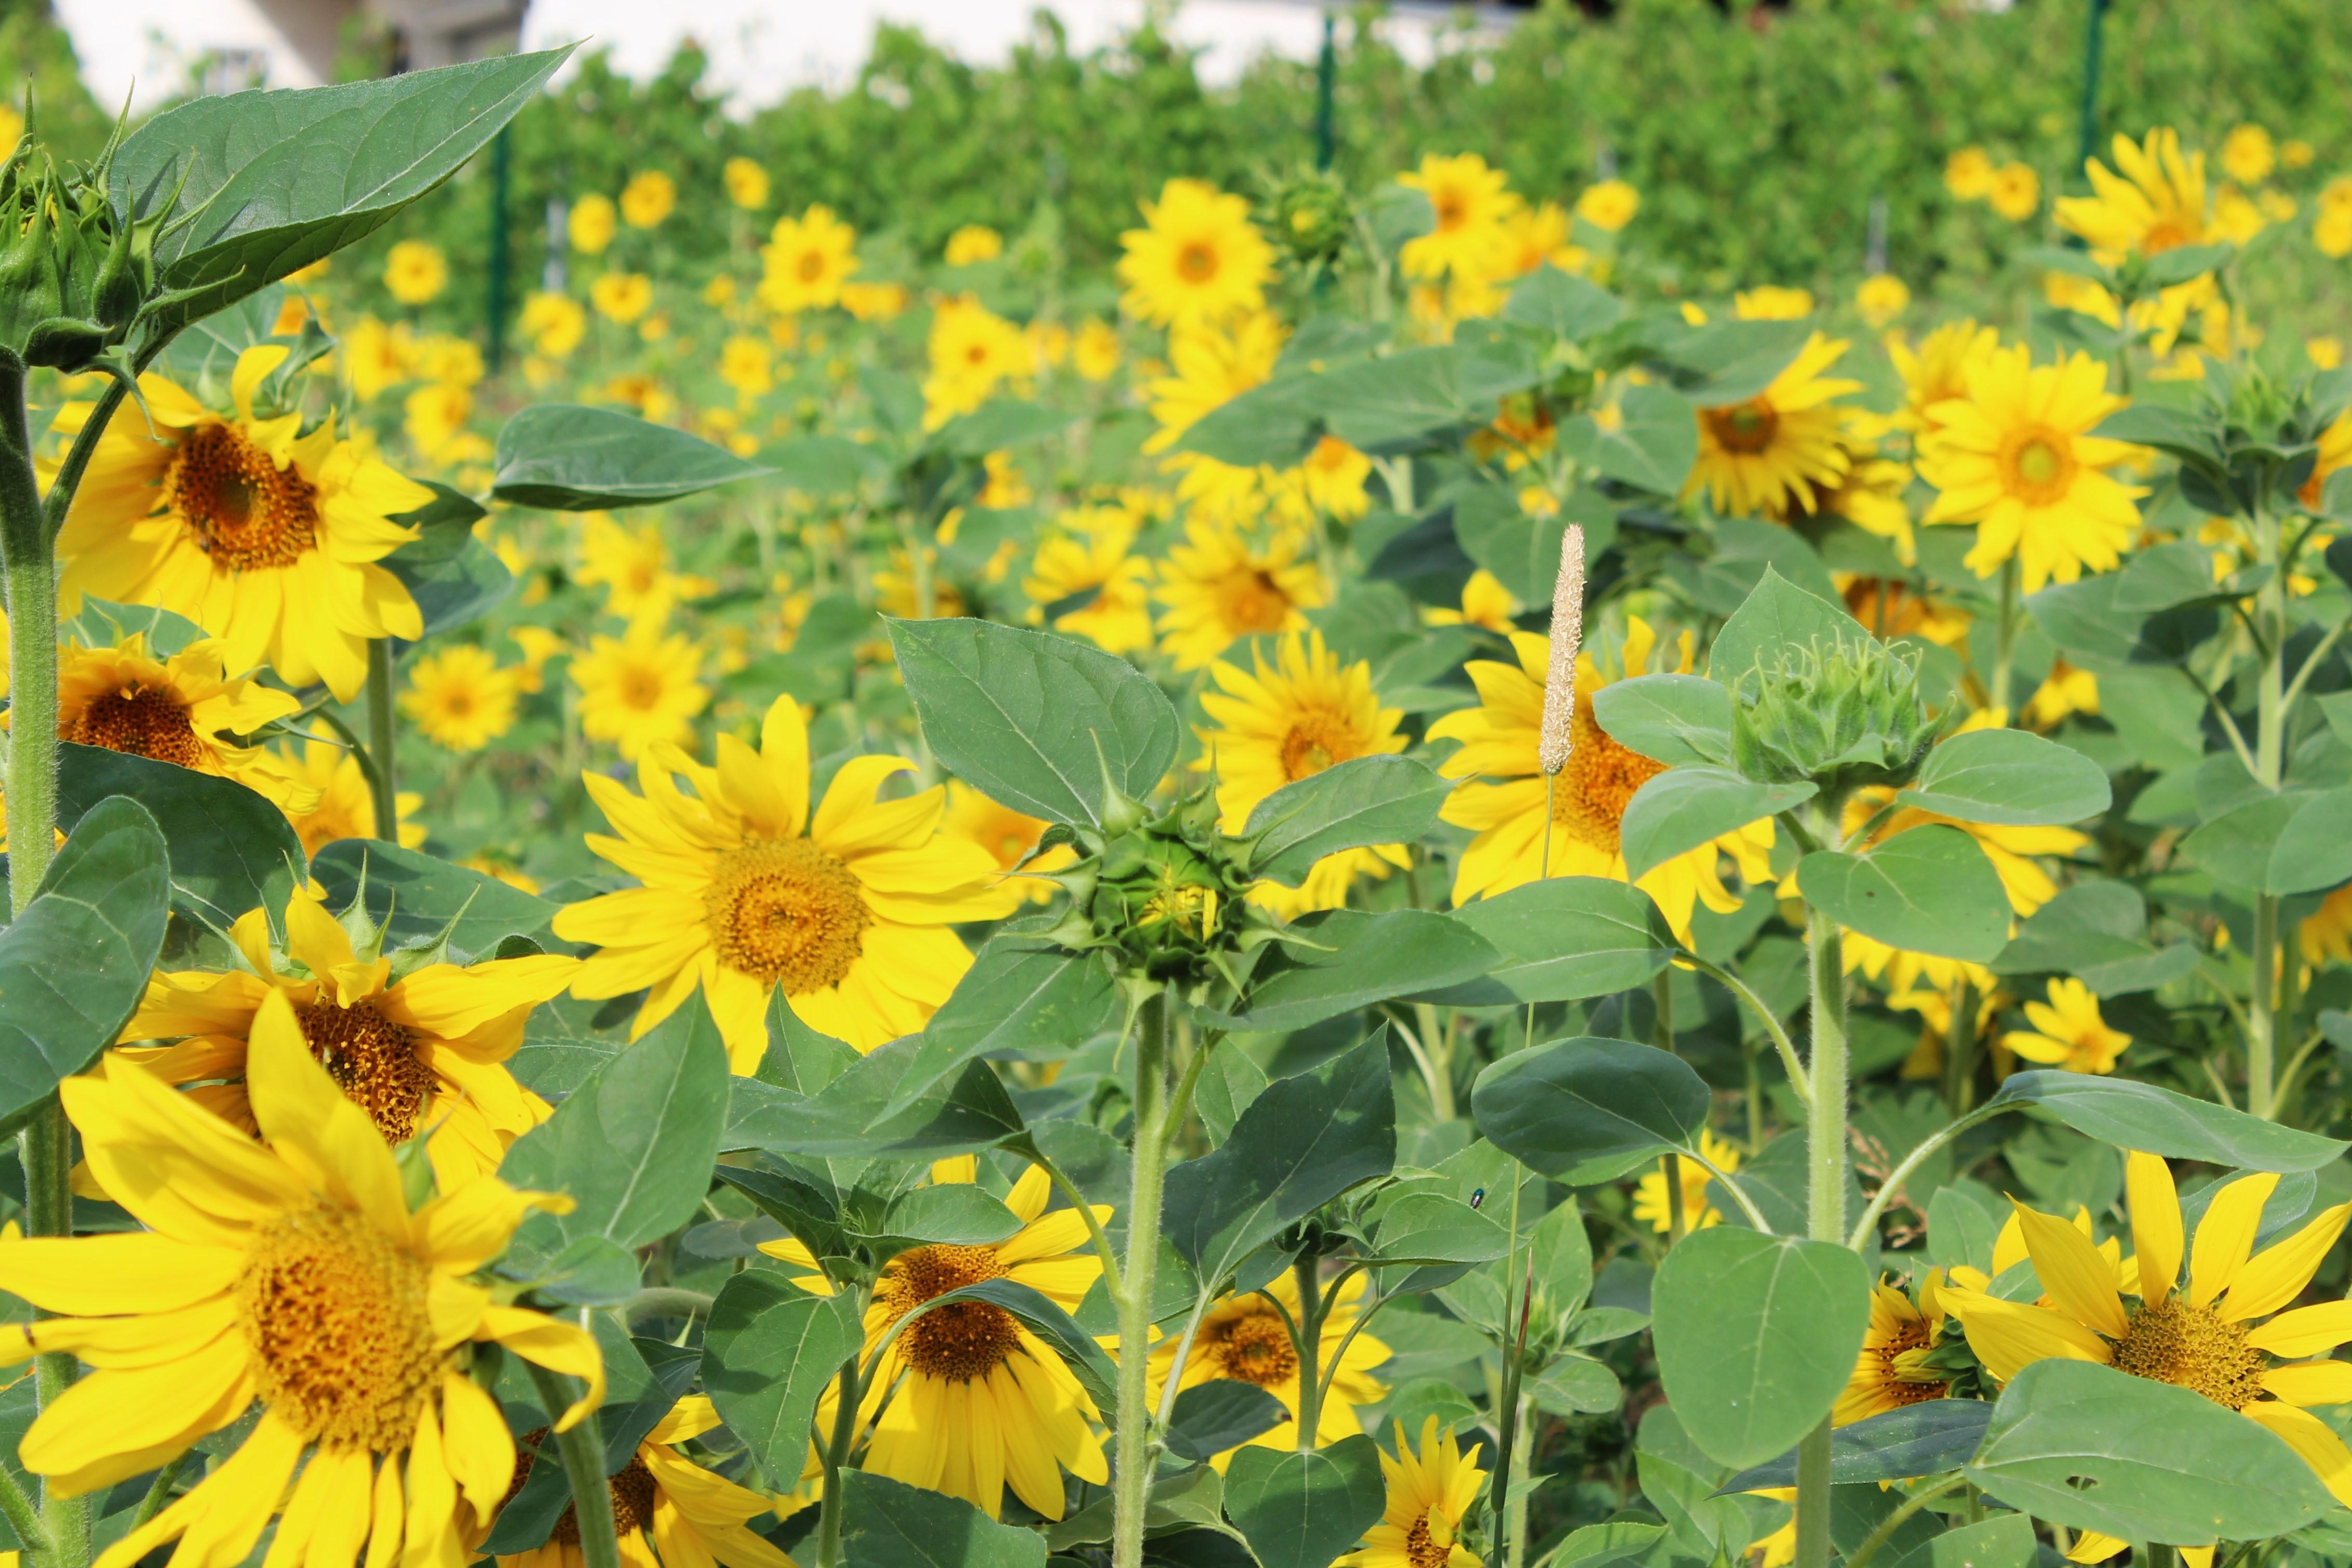 Blumenwiese anlegen Erfahrung